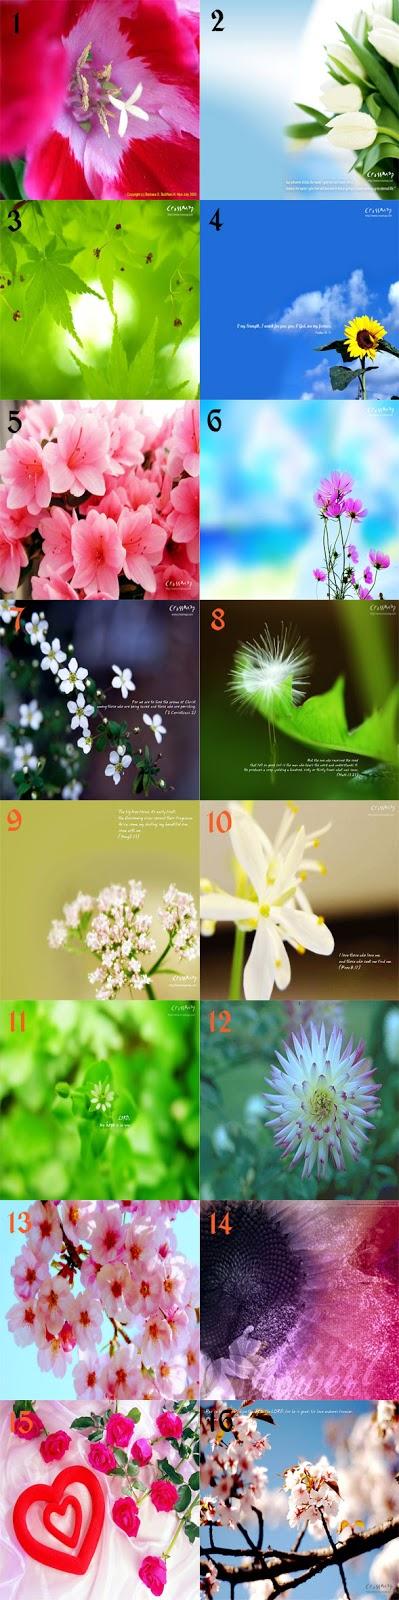 400+ Gambar Bunga Cantik Untuk Wallpaper  Paling Keren